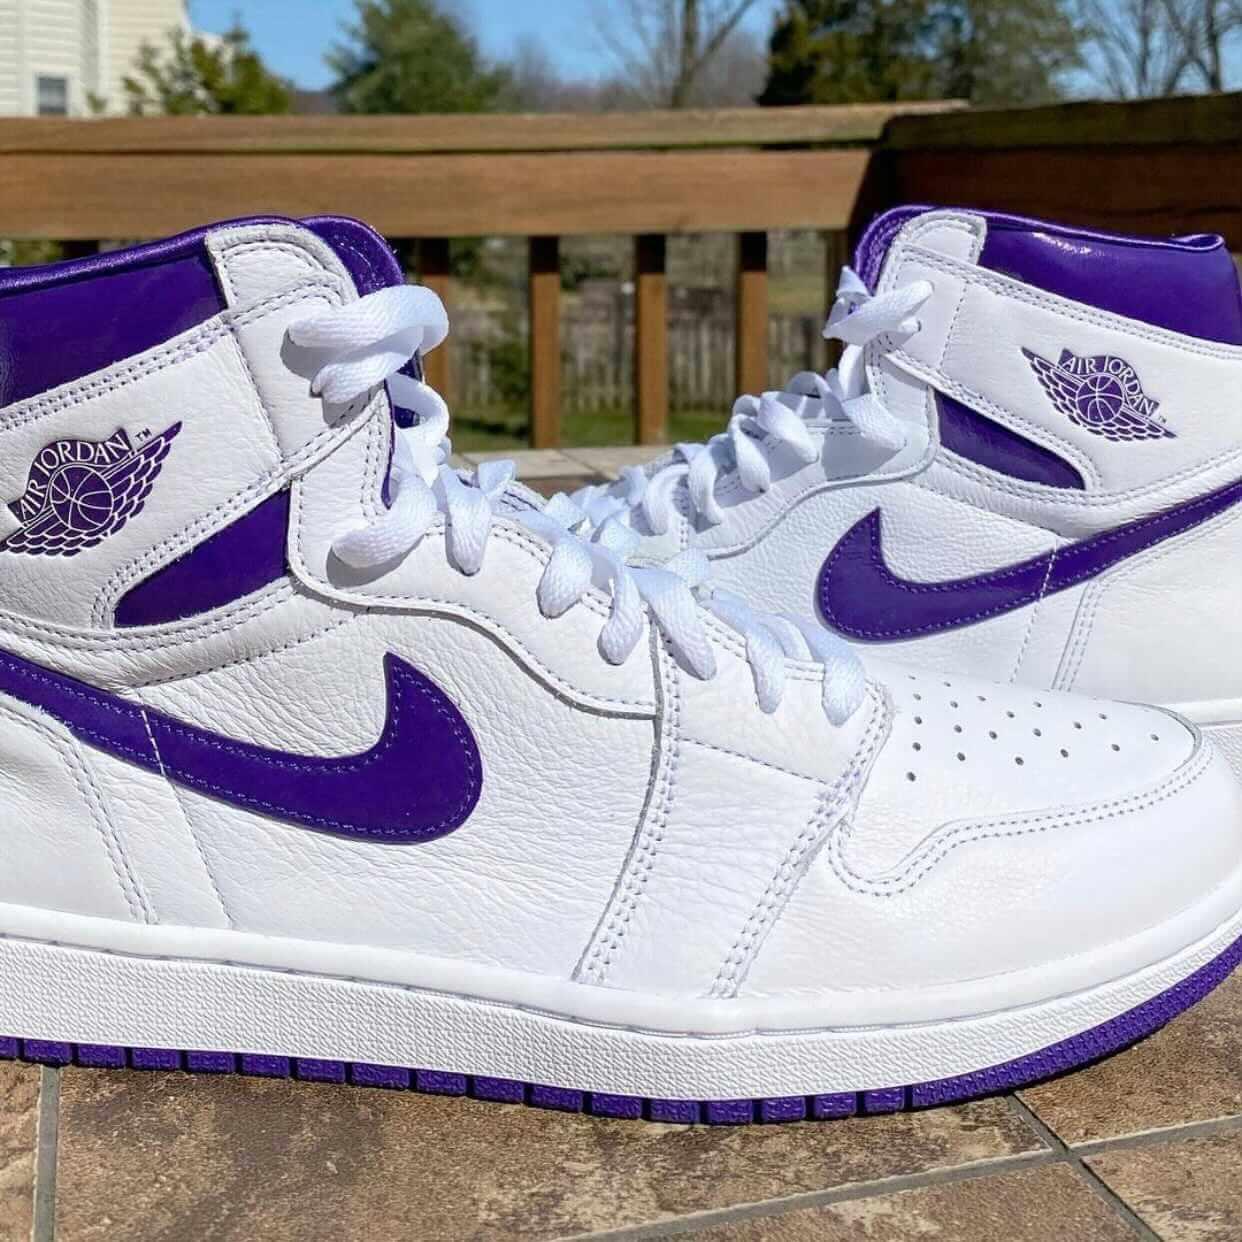 "nike Air Jordan 1 High ""Court Purple"" ナイキ ウィメンズ エア ジョーダン 1 ハイ ""コート パープル"" CU0449-151 detail"